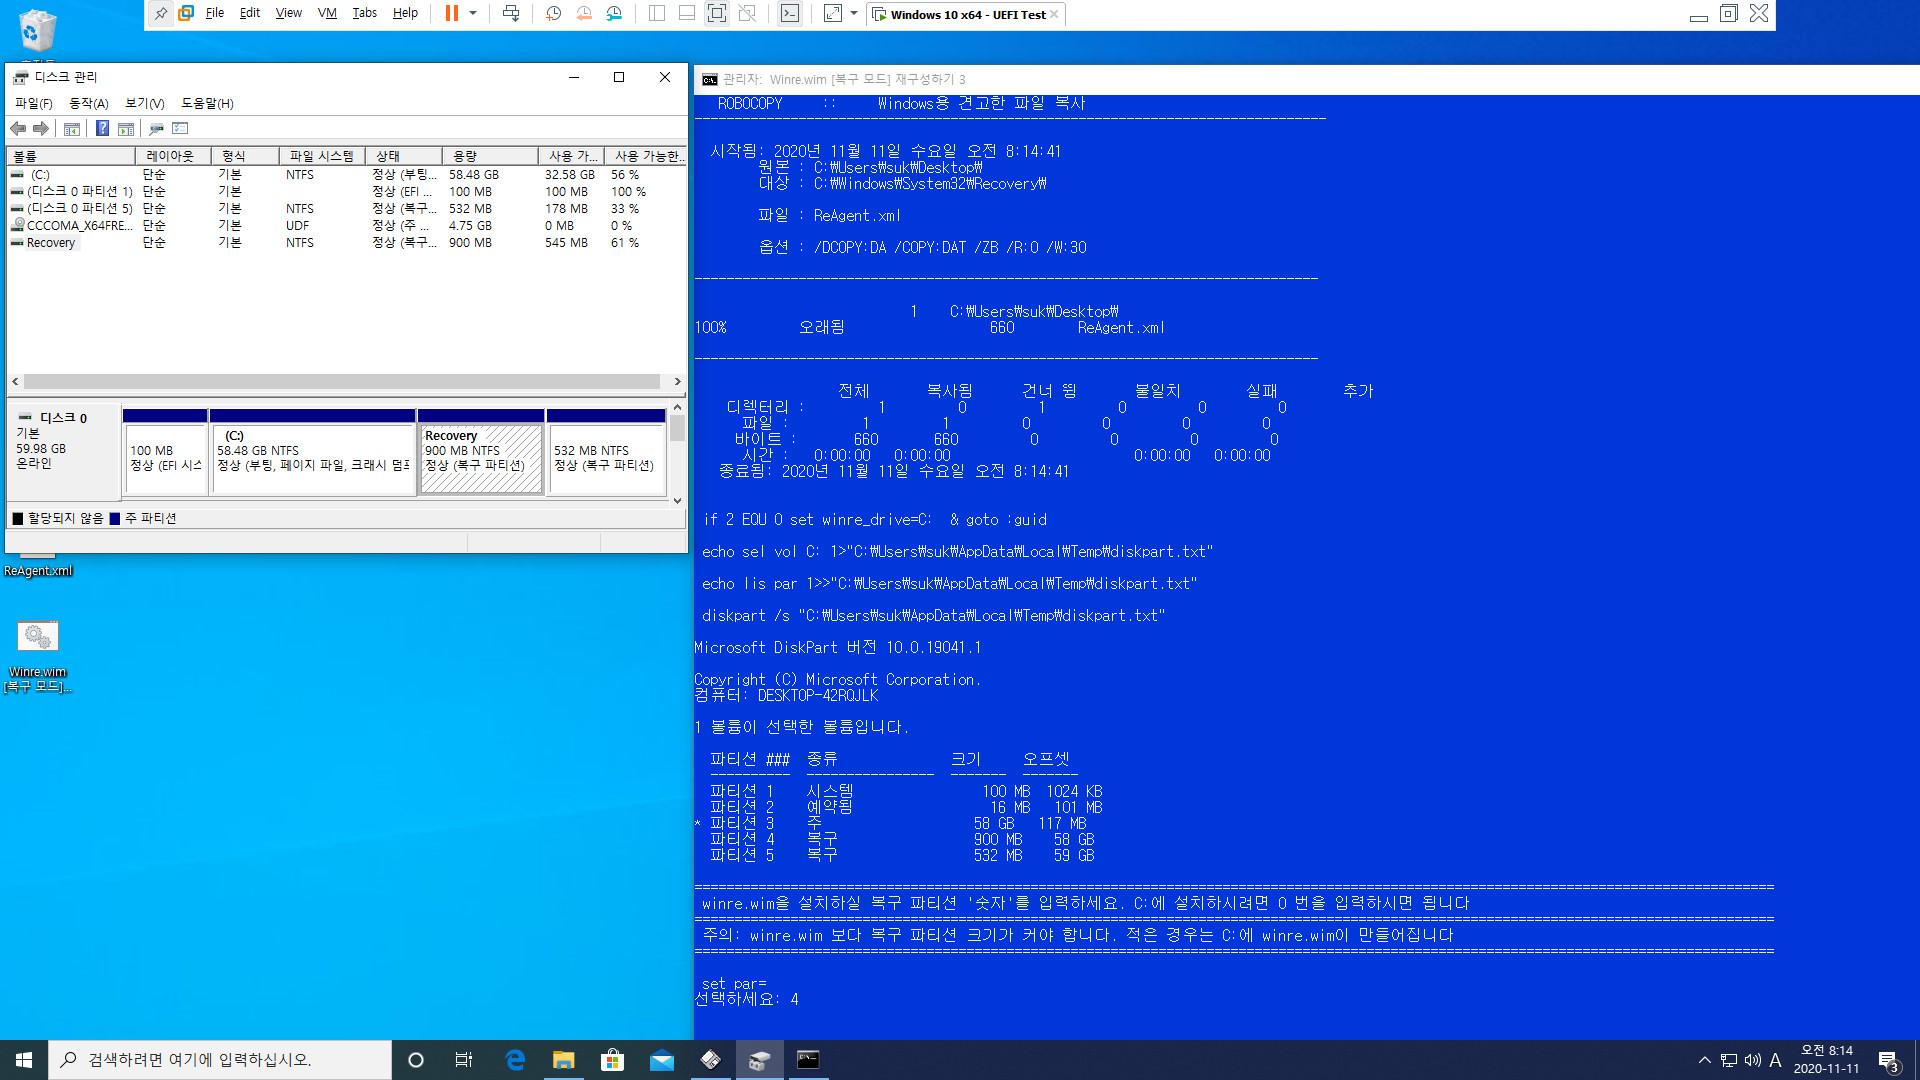 Winre.wim [복구 모드] 재구성하기 3 - 복구파티션 포함 [2020-11-11].bat 테스트 2020-11-11_081449.jpg